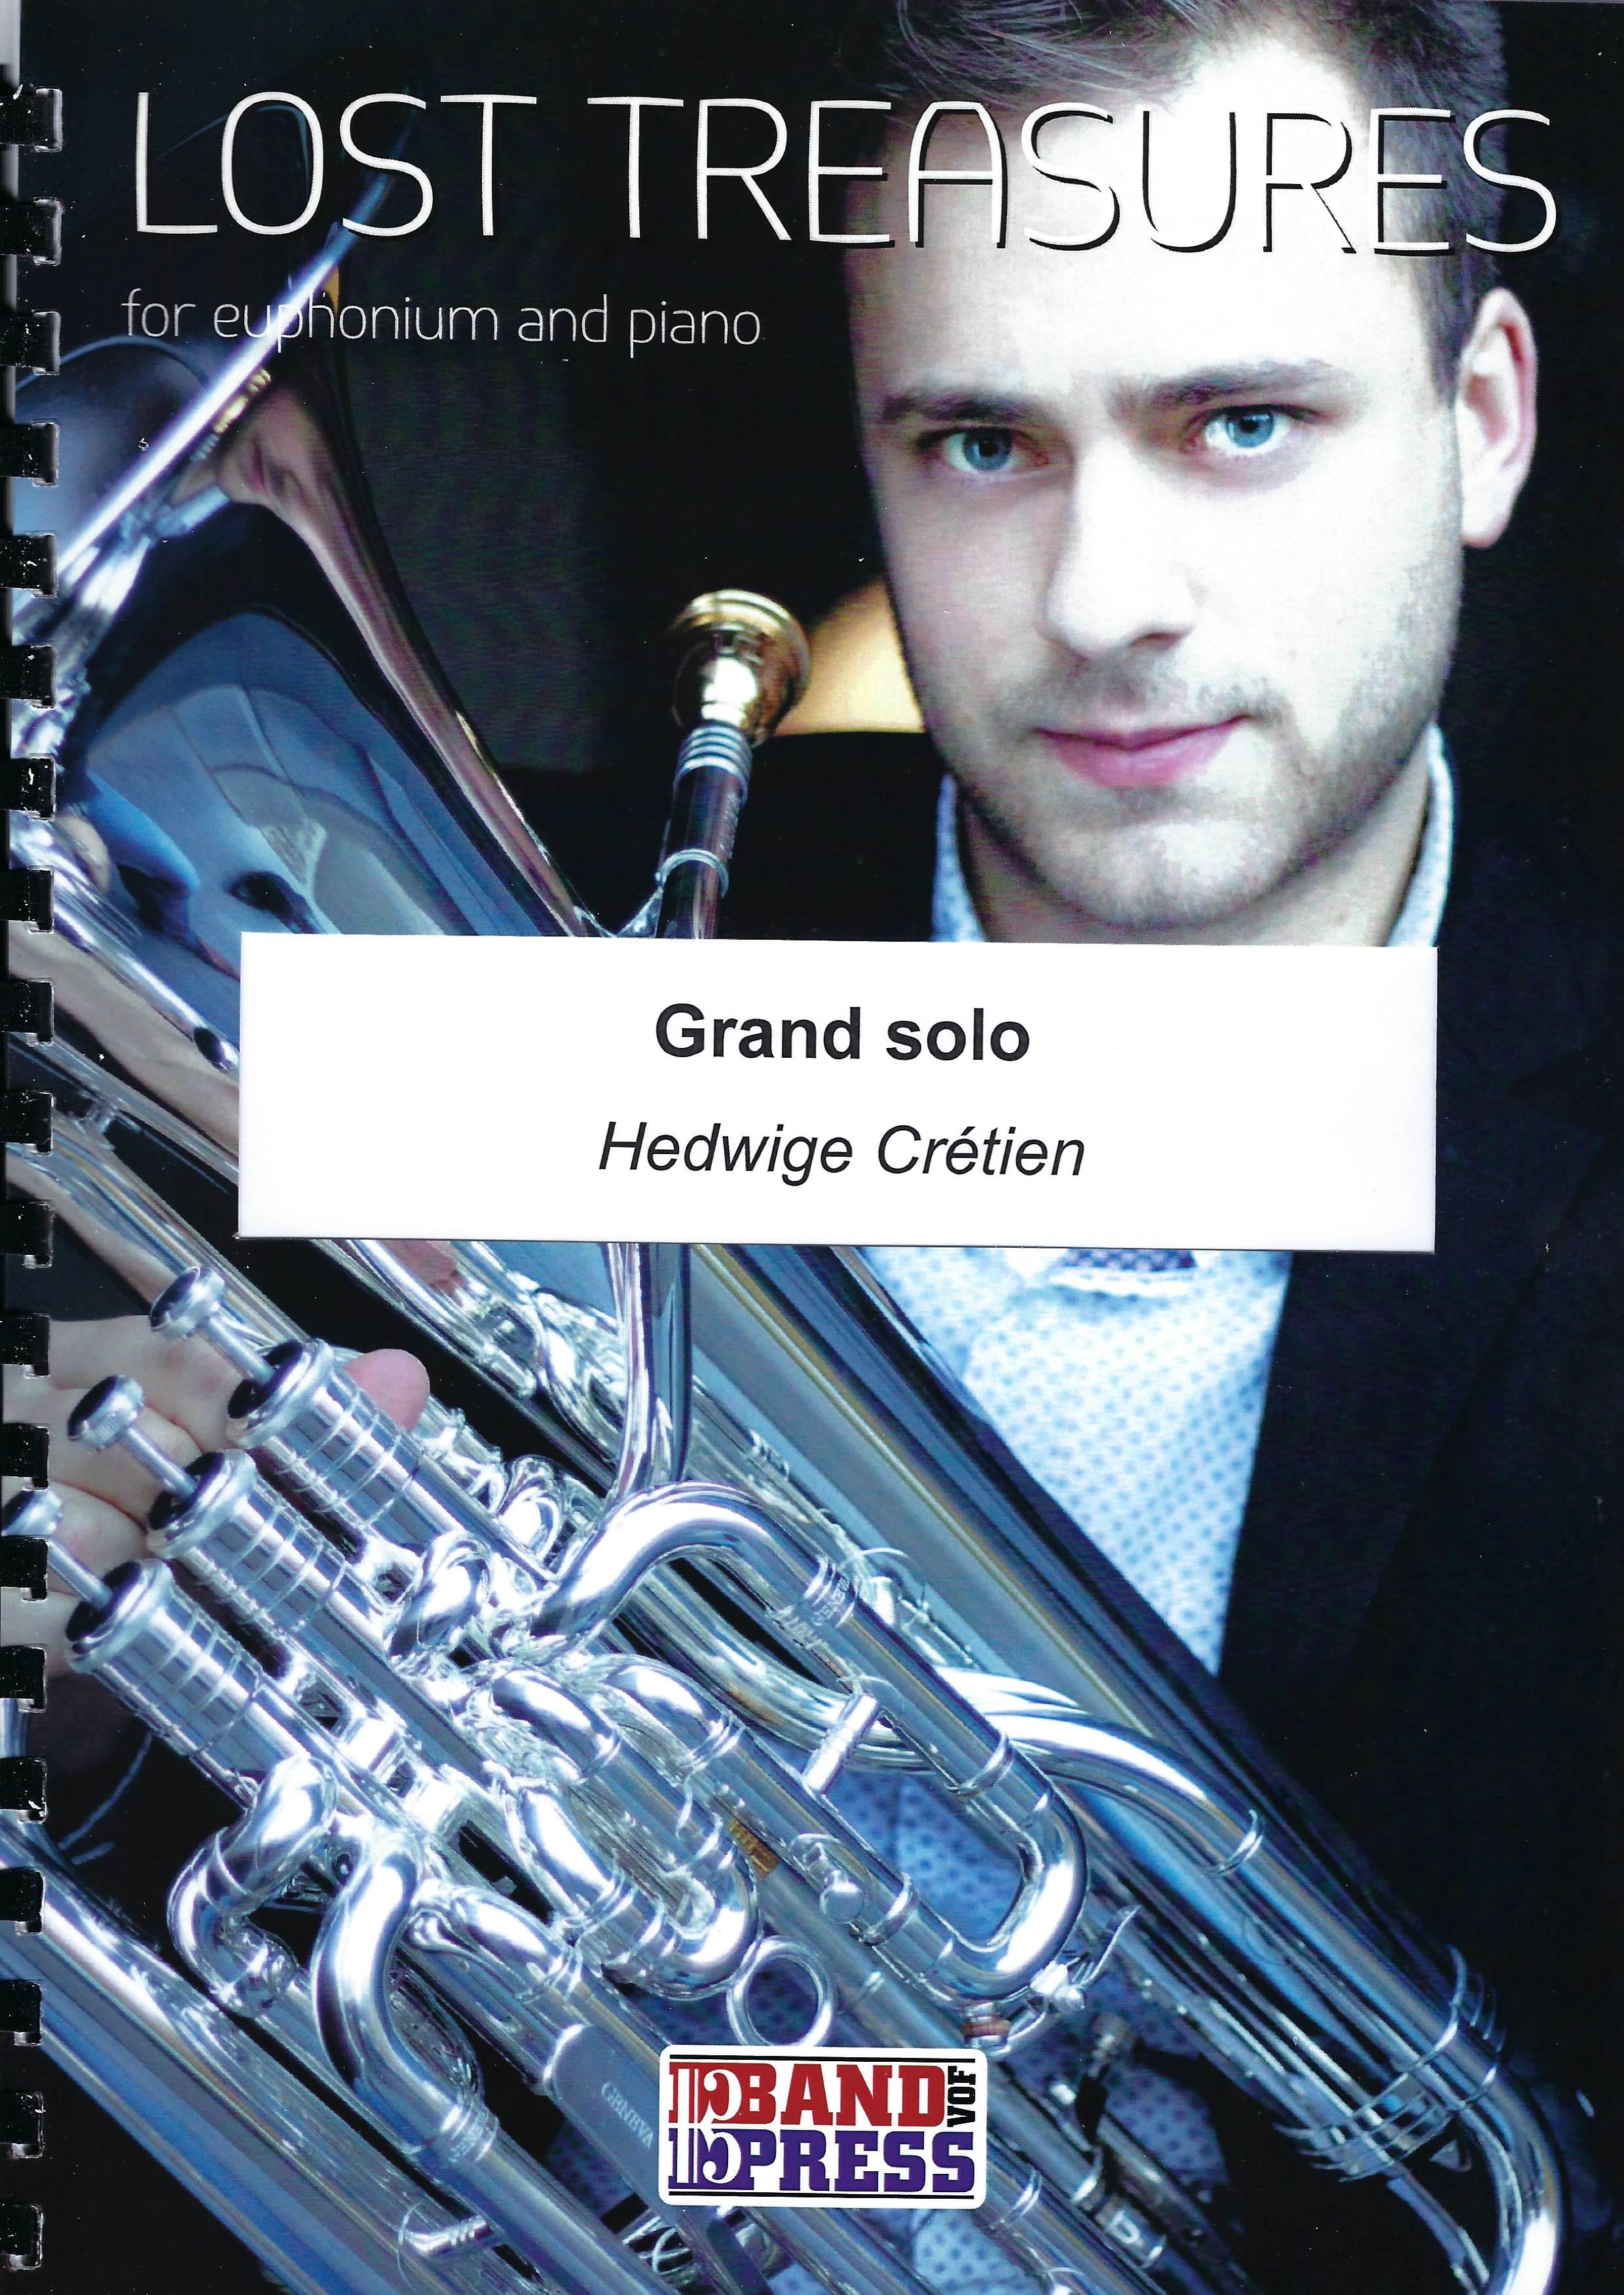 Grand Solo - Hedwige Cretien - Euph and Piano (Lost Treasures Series)